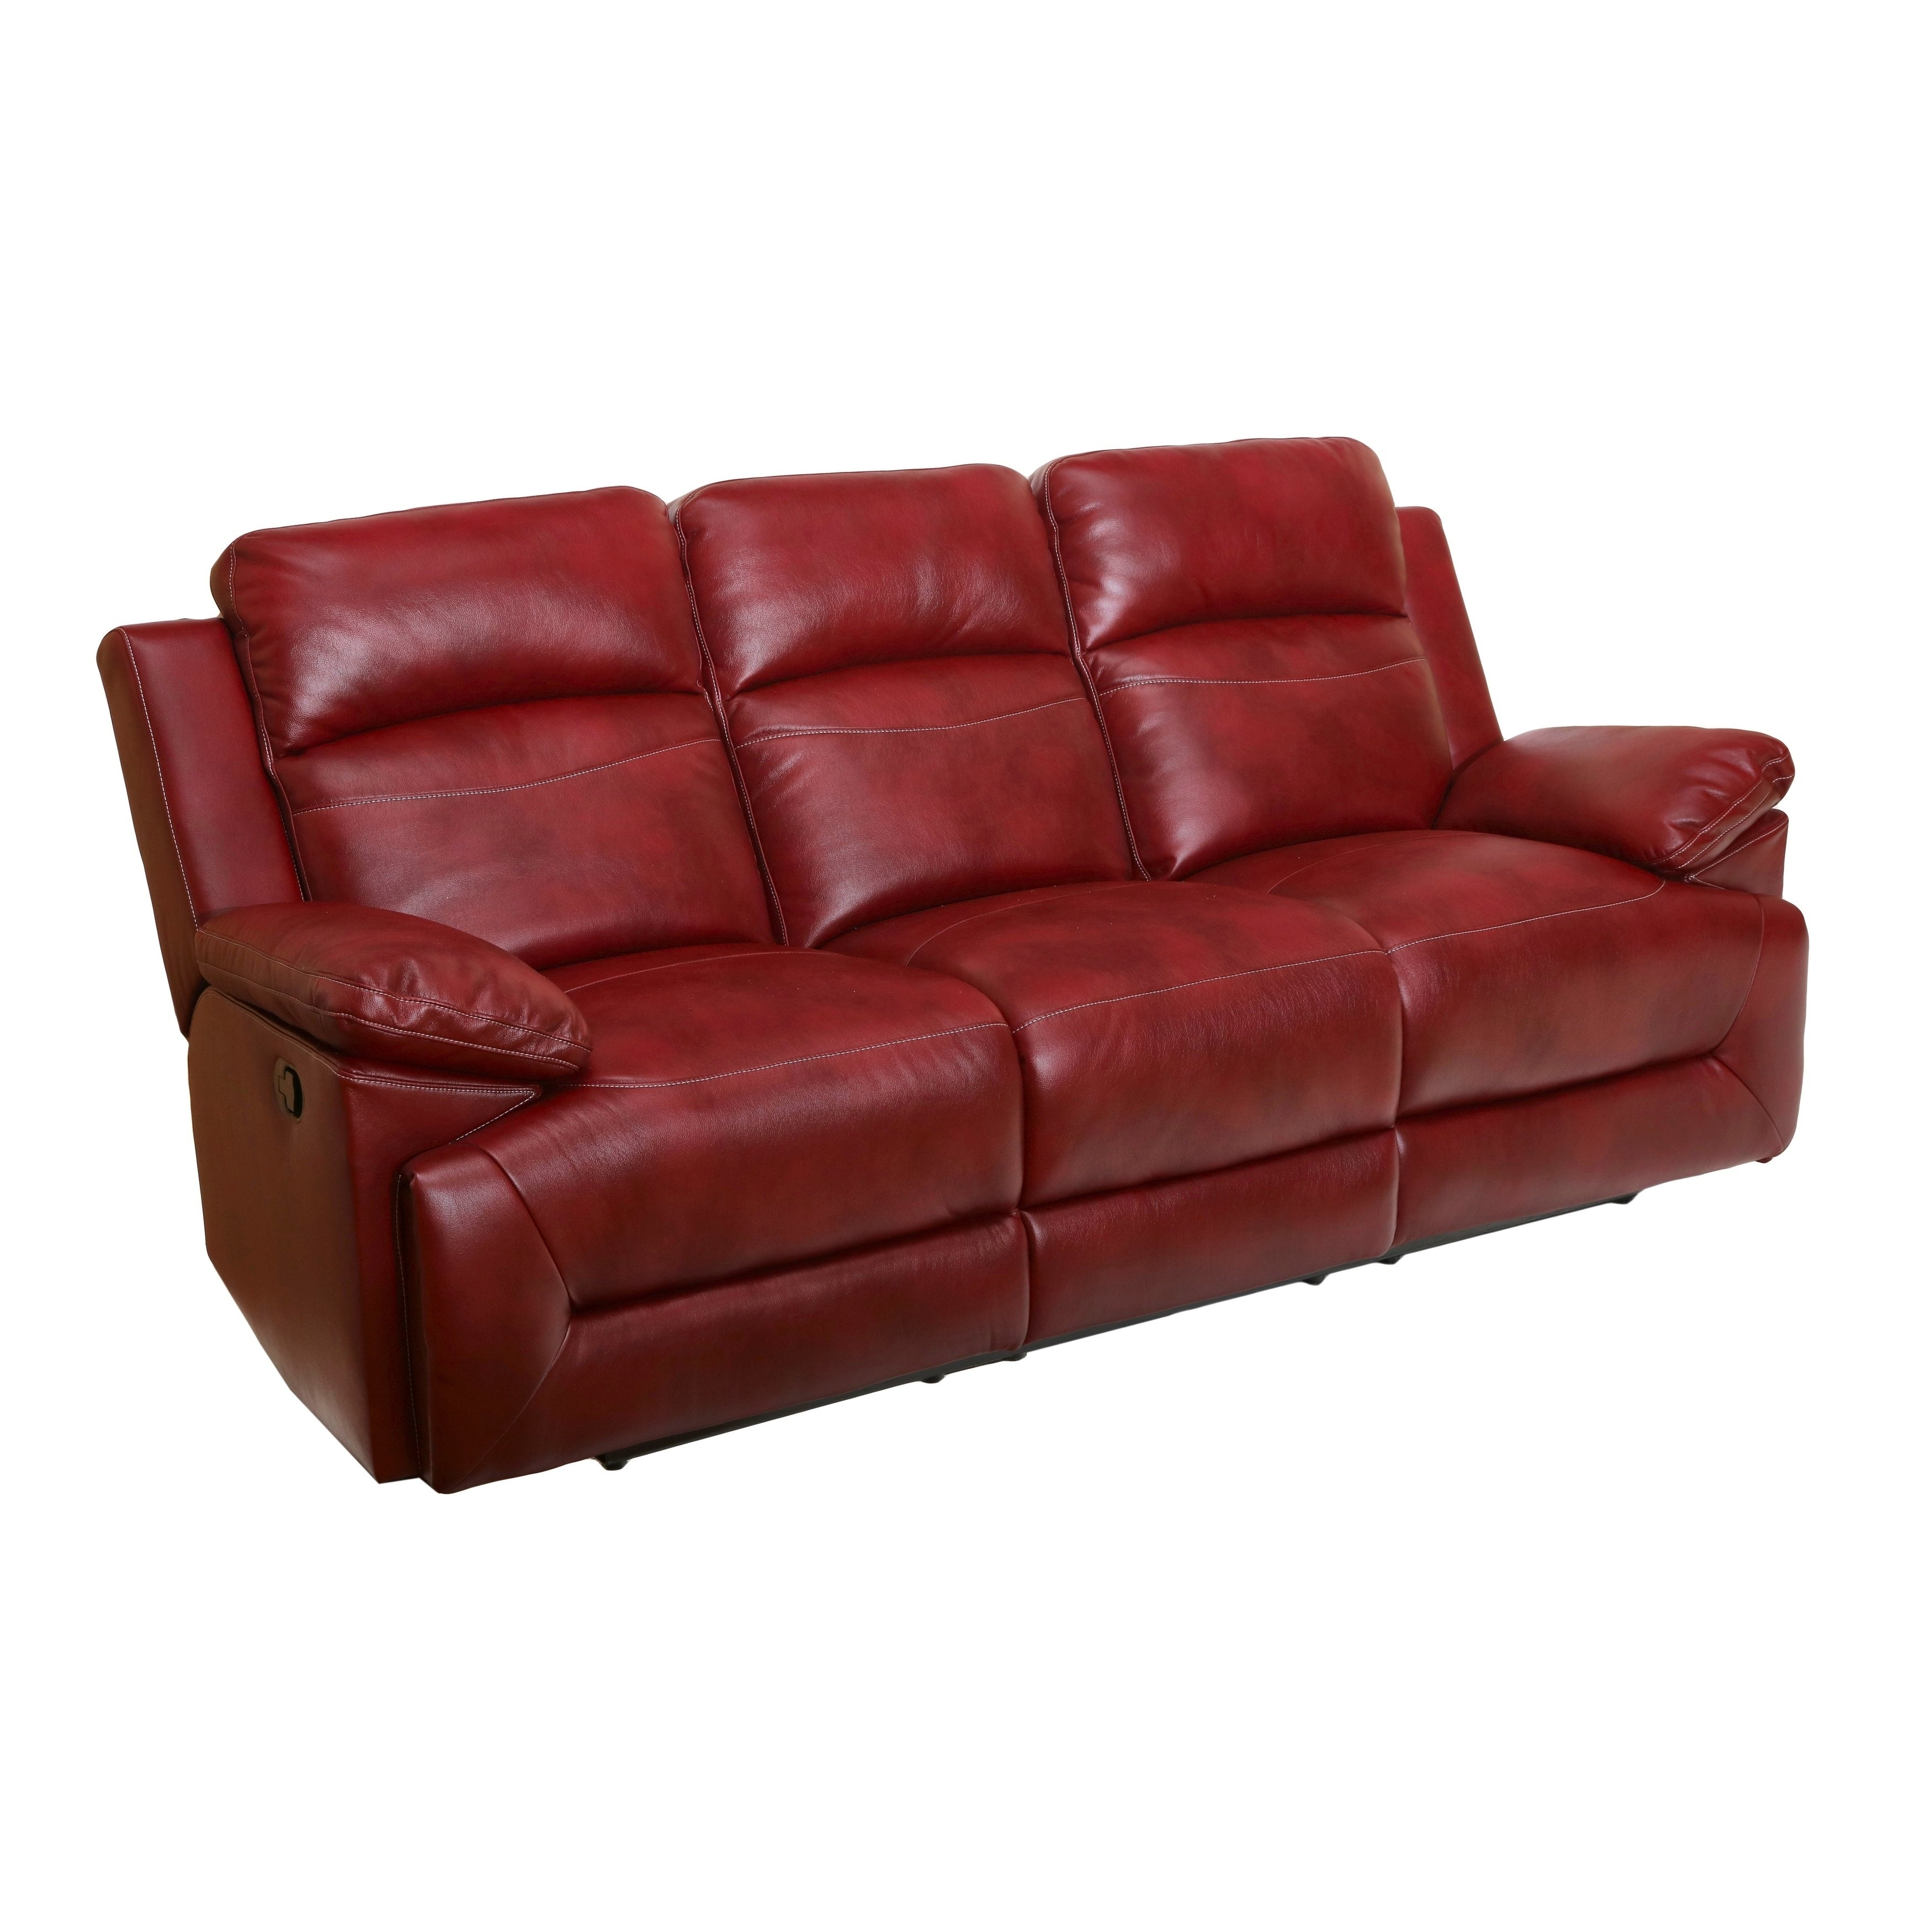 Power Reclining Sofa Vs Manual   Baci Living Room For Calder Grey 6 Piece Manual Reclining Sectionals (Image 21 of 25)